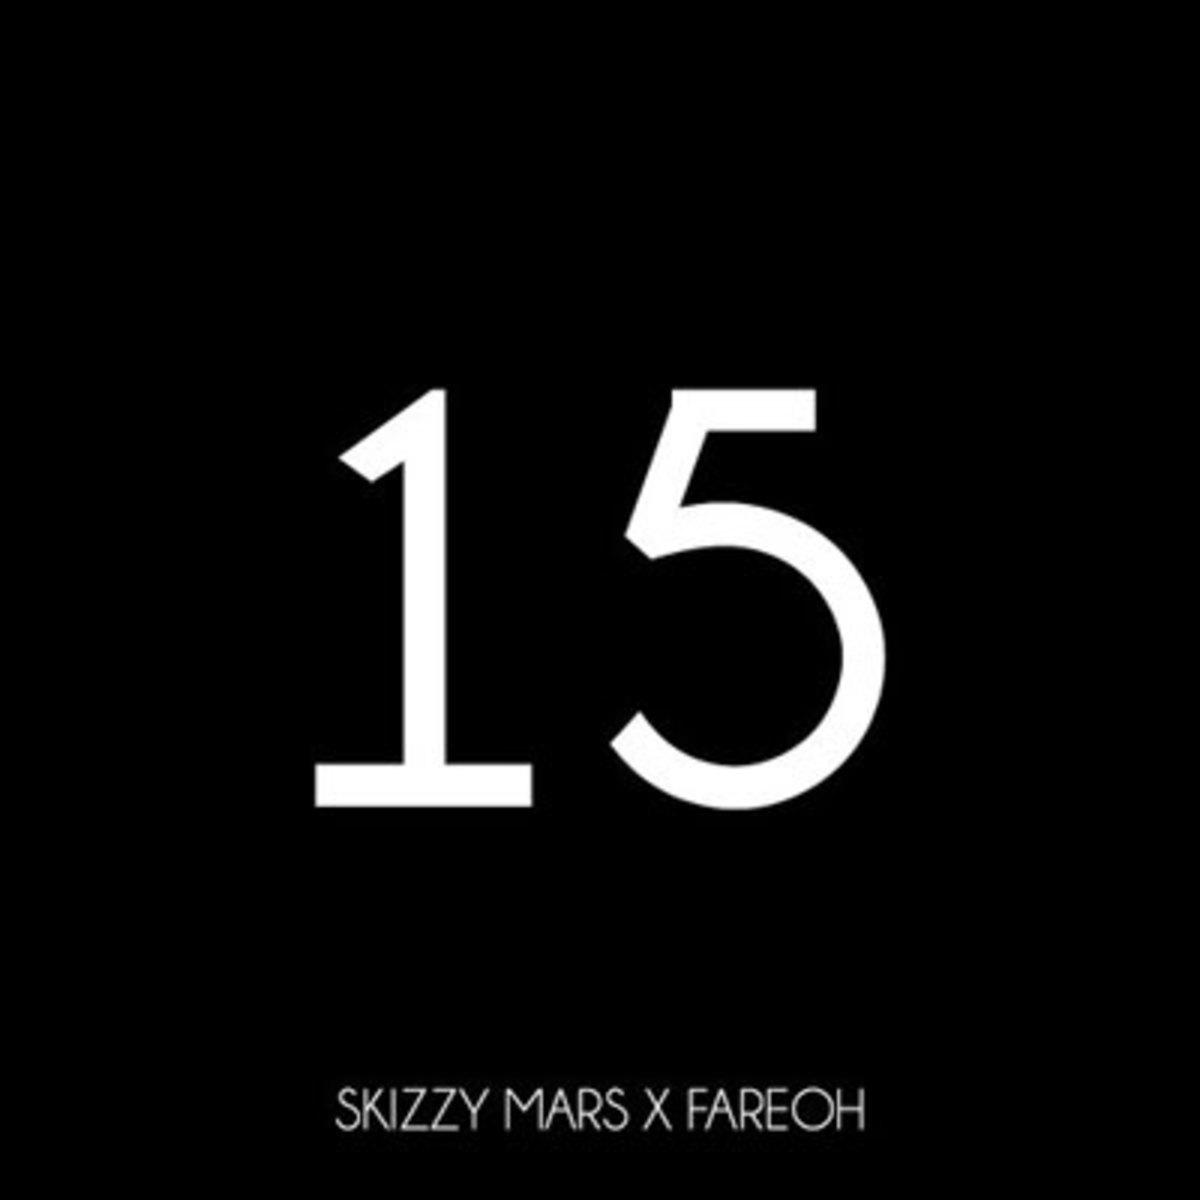 skizzymars-15.jpg